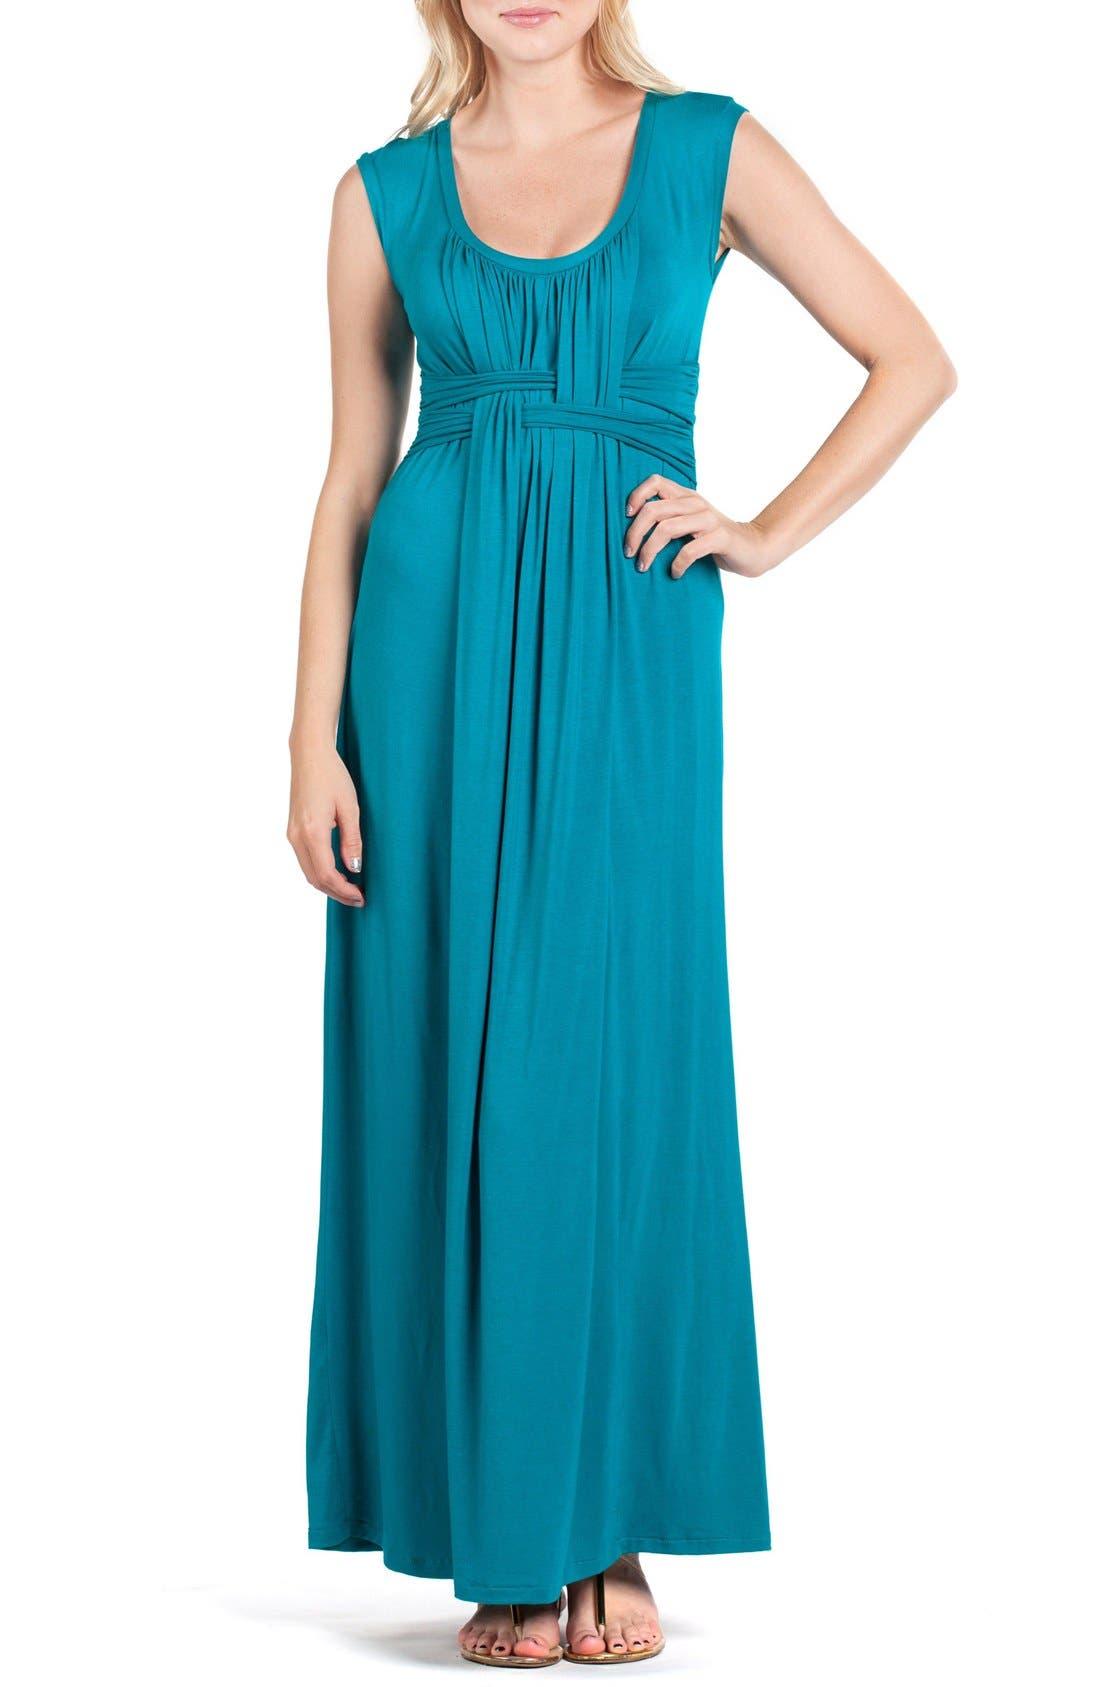 Athens Maternity/Nursing Maxi Dress,                             Main thumbnail 1, color,                             JADE